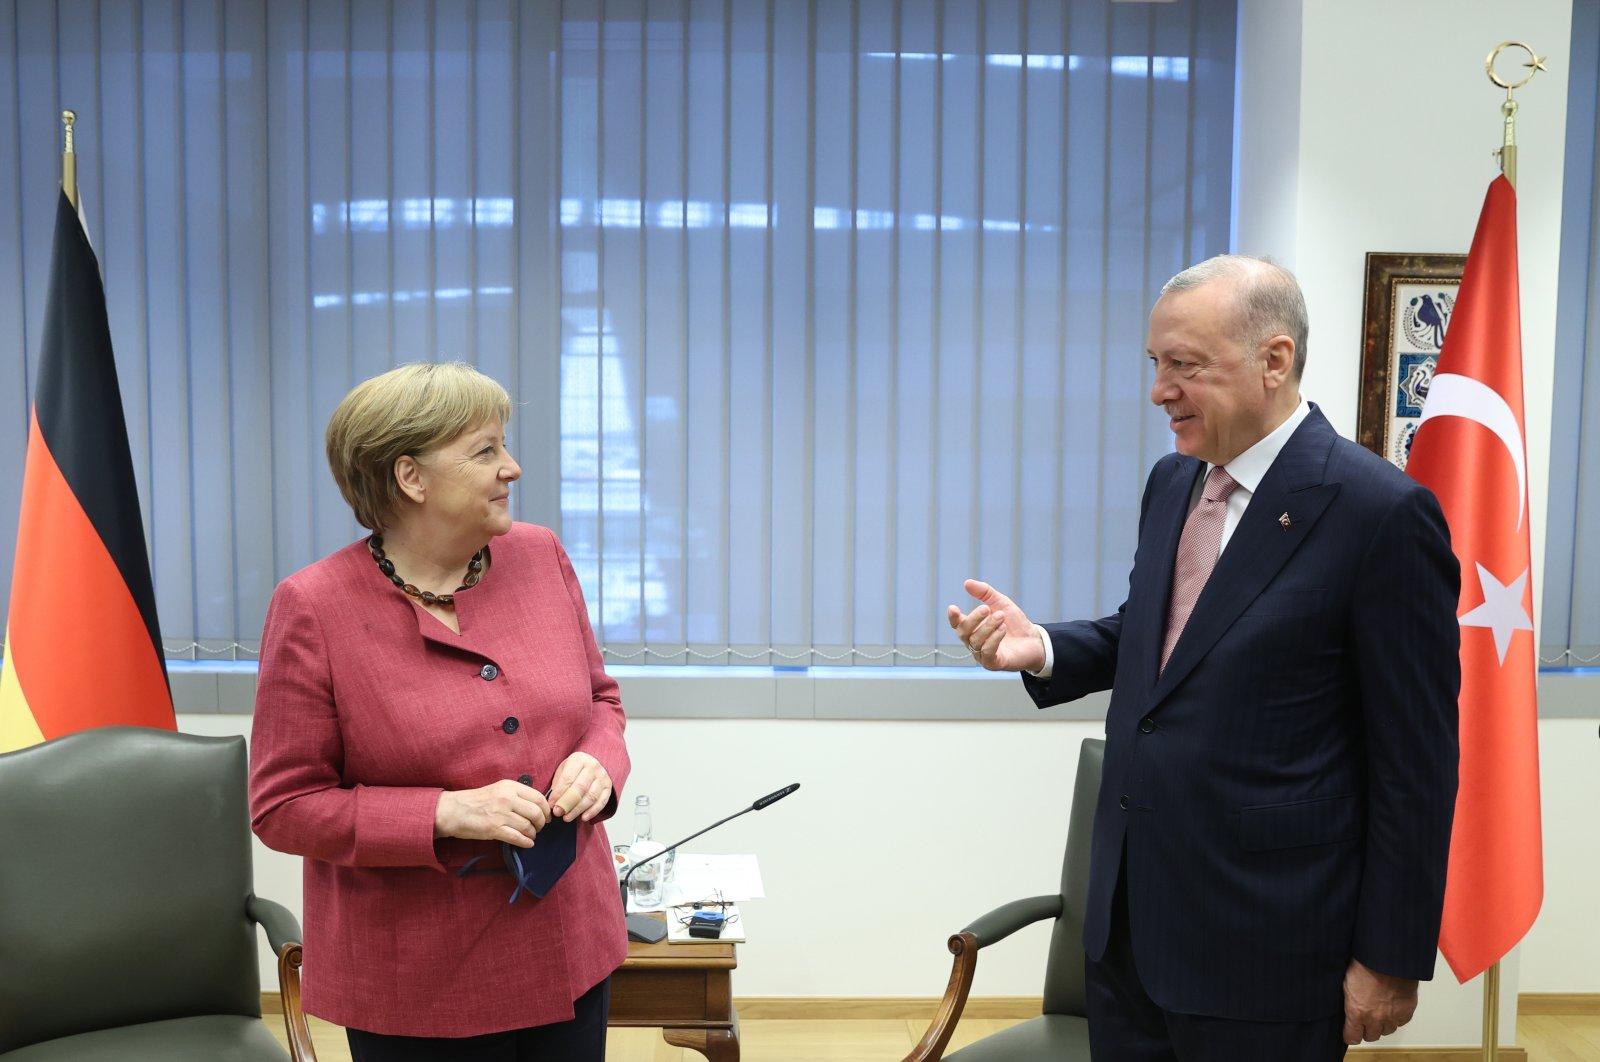 President Recep Tayyip Erdoğan and German Chancellor Angela Merkel gesture at the NATO summit in Brussels, Belgium, June 14, 2021. (AA Photo)